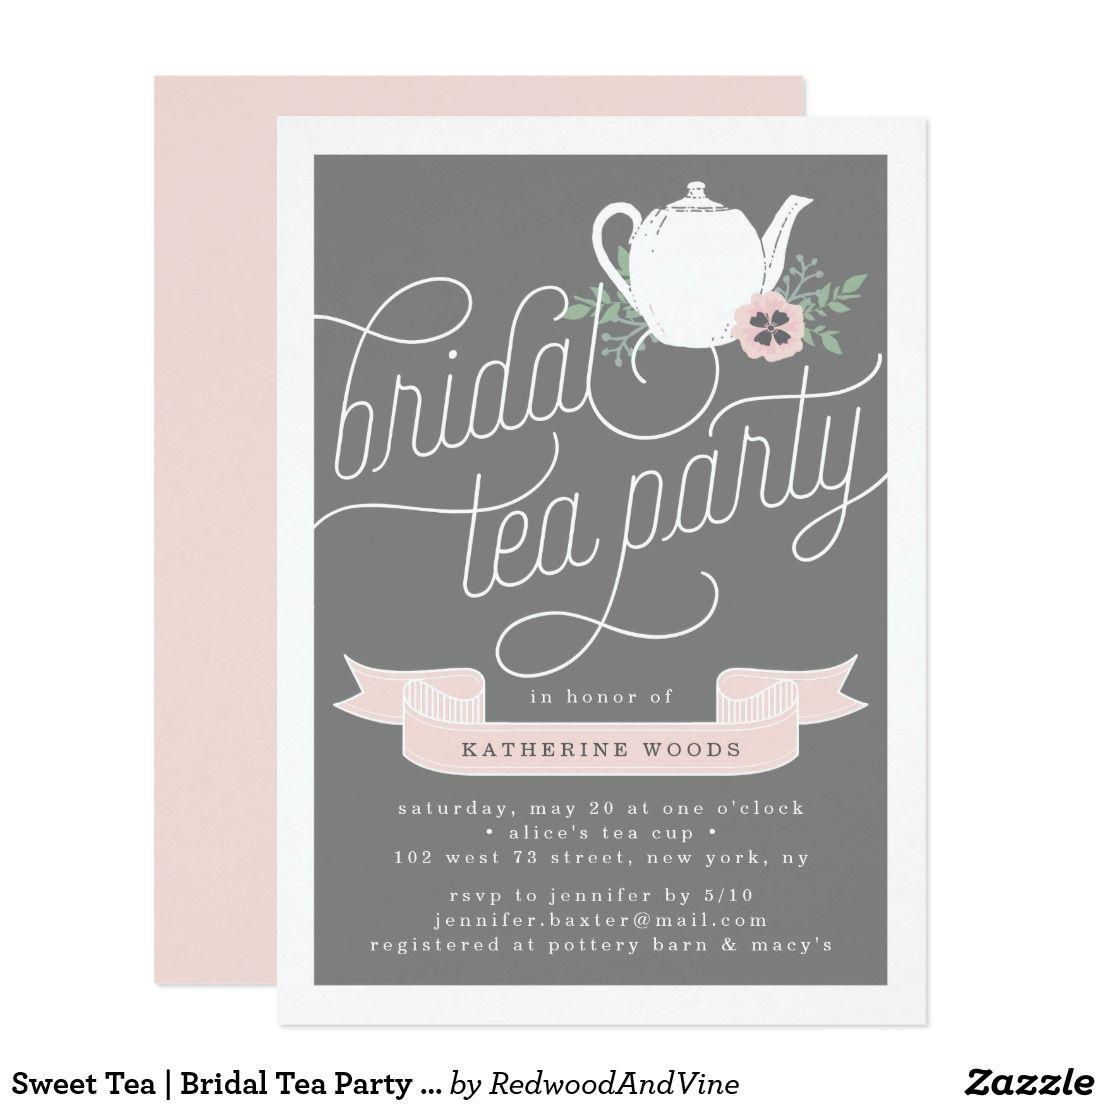 Sweet Tea | Bridal Tea Party Invitation | Bridal Shower | Pinterest ...